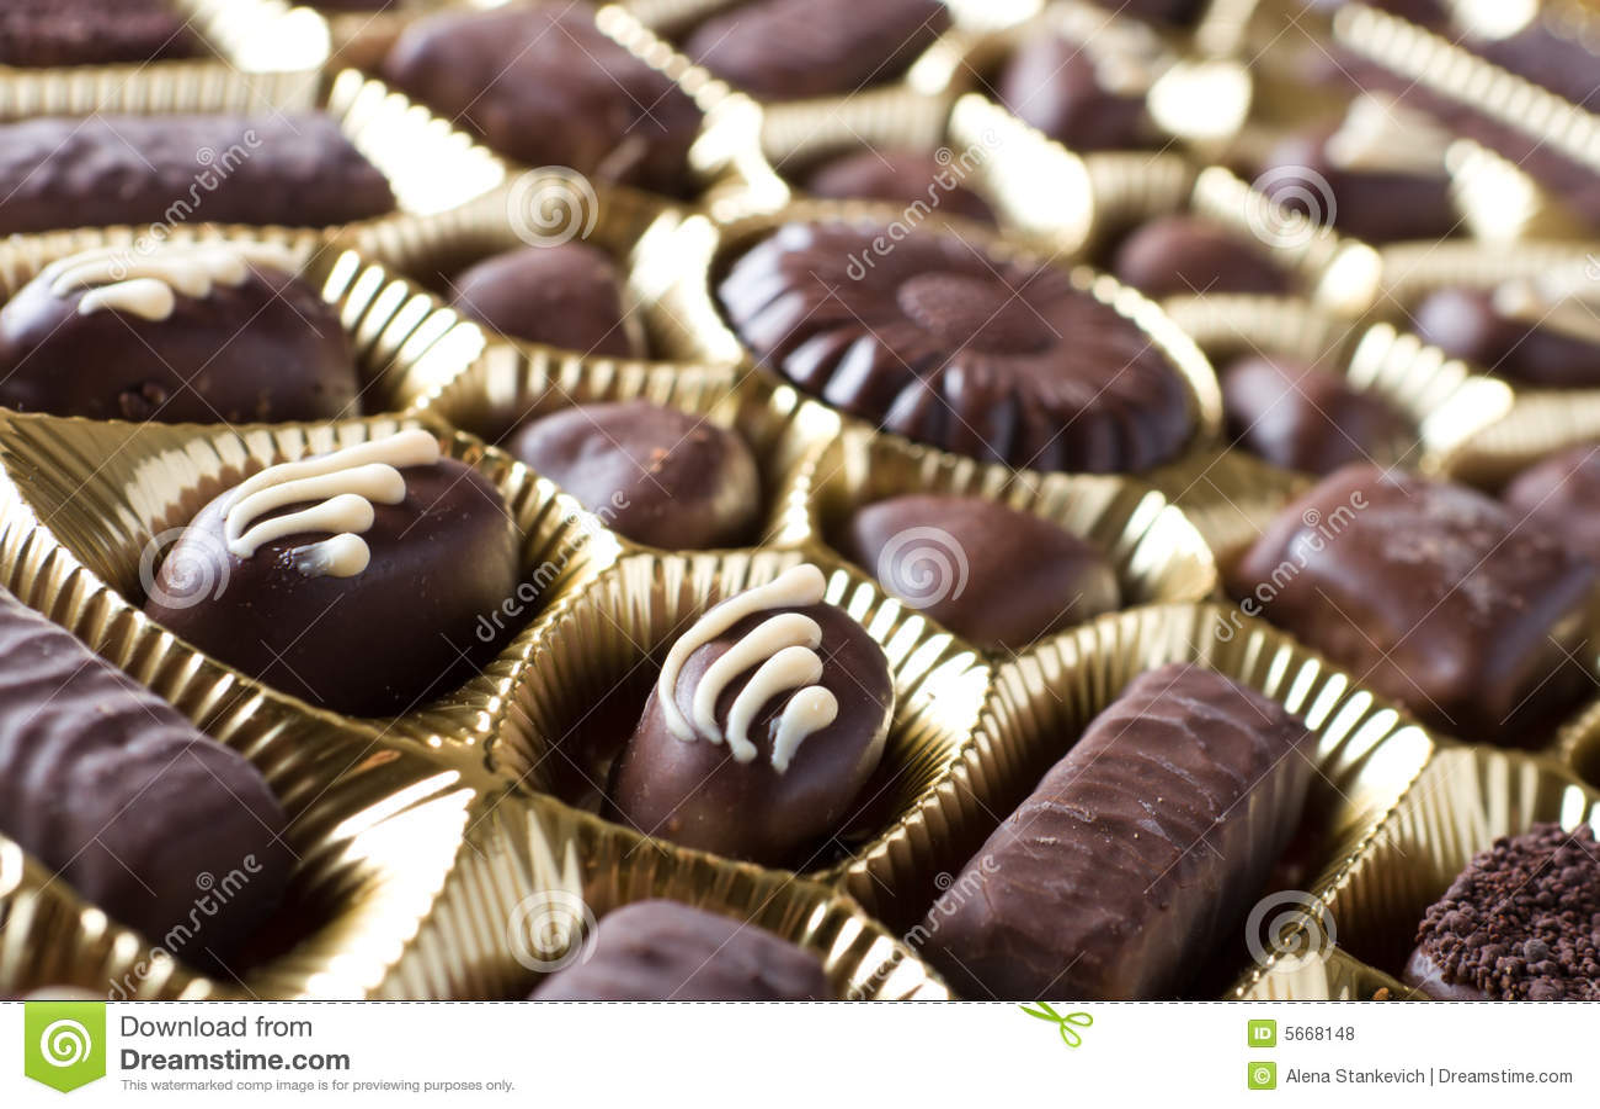 помадки шоколада